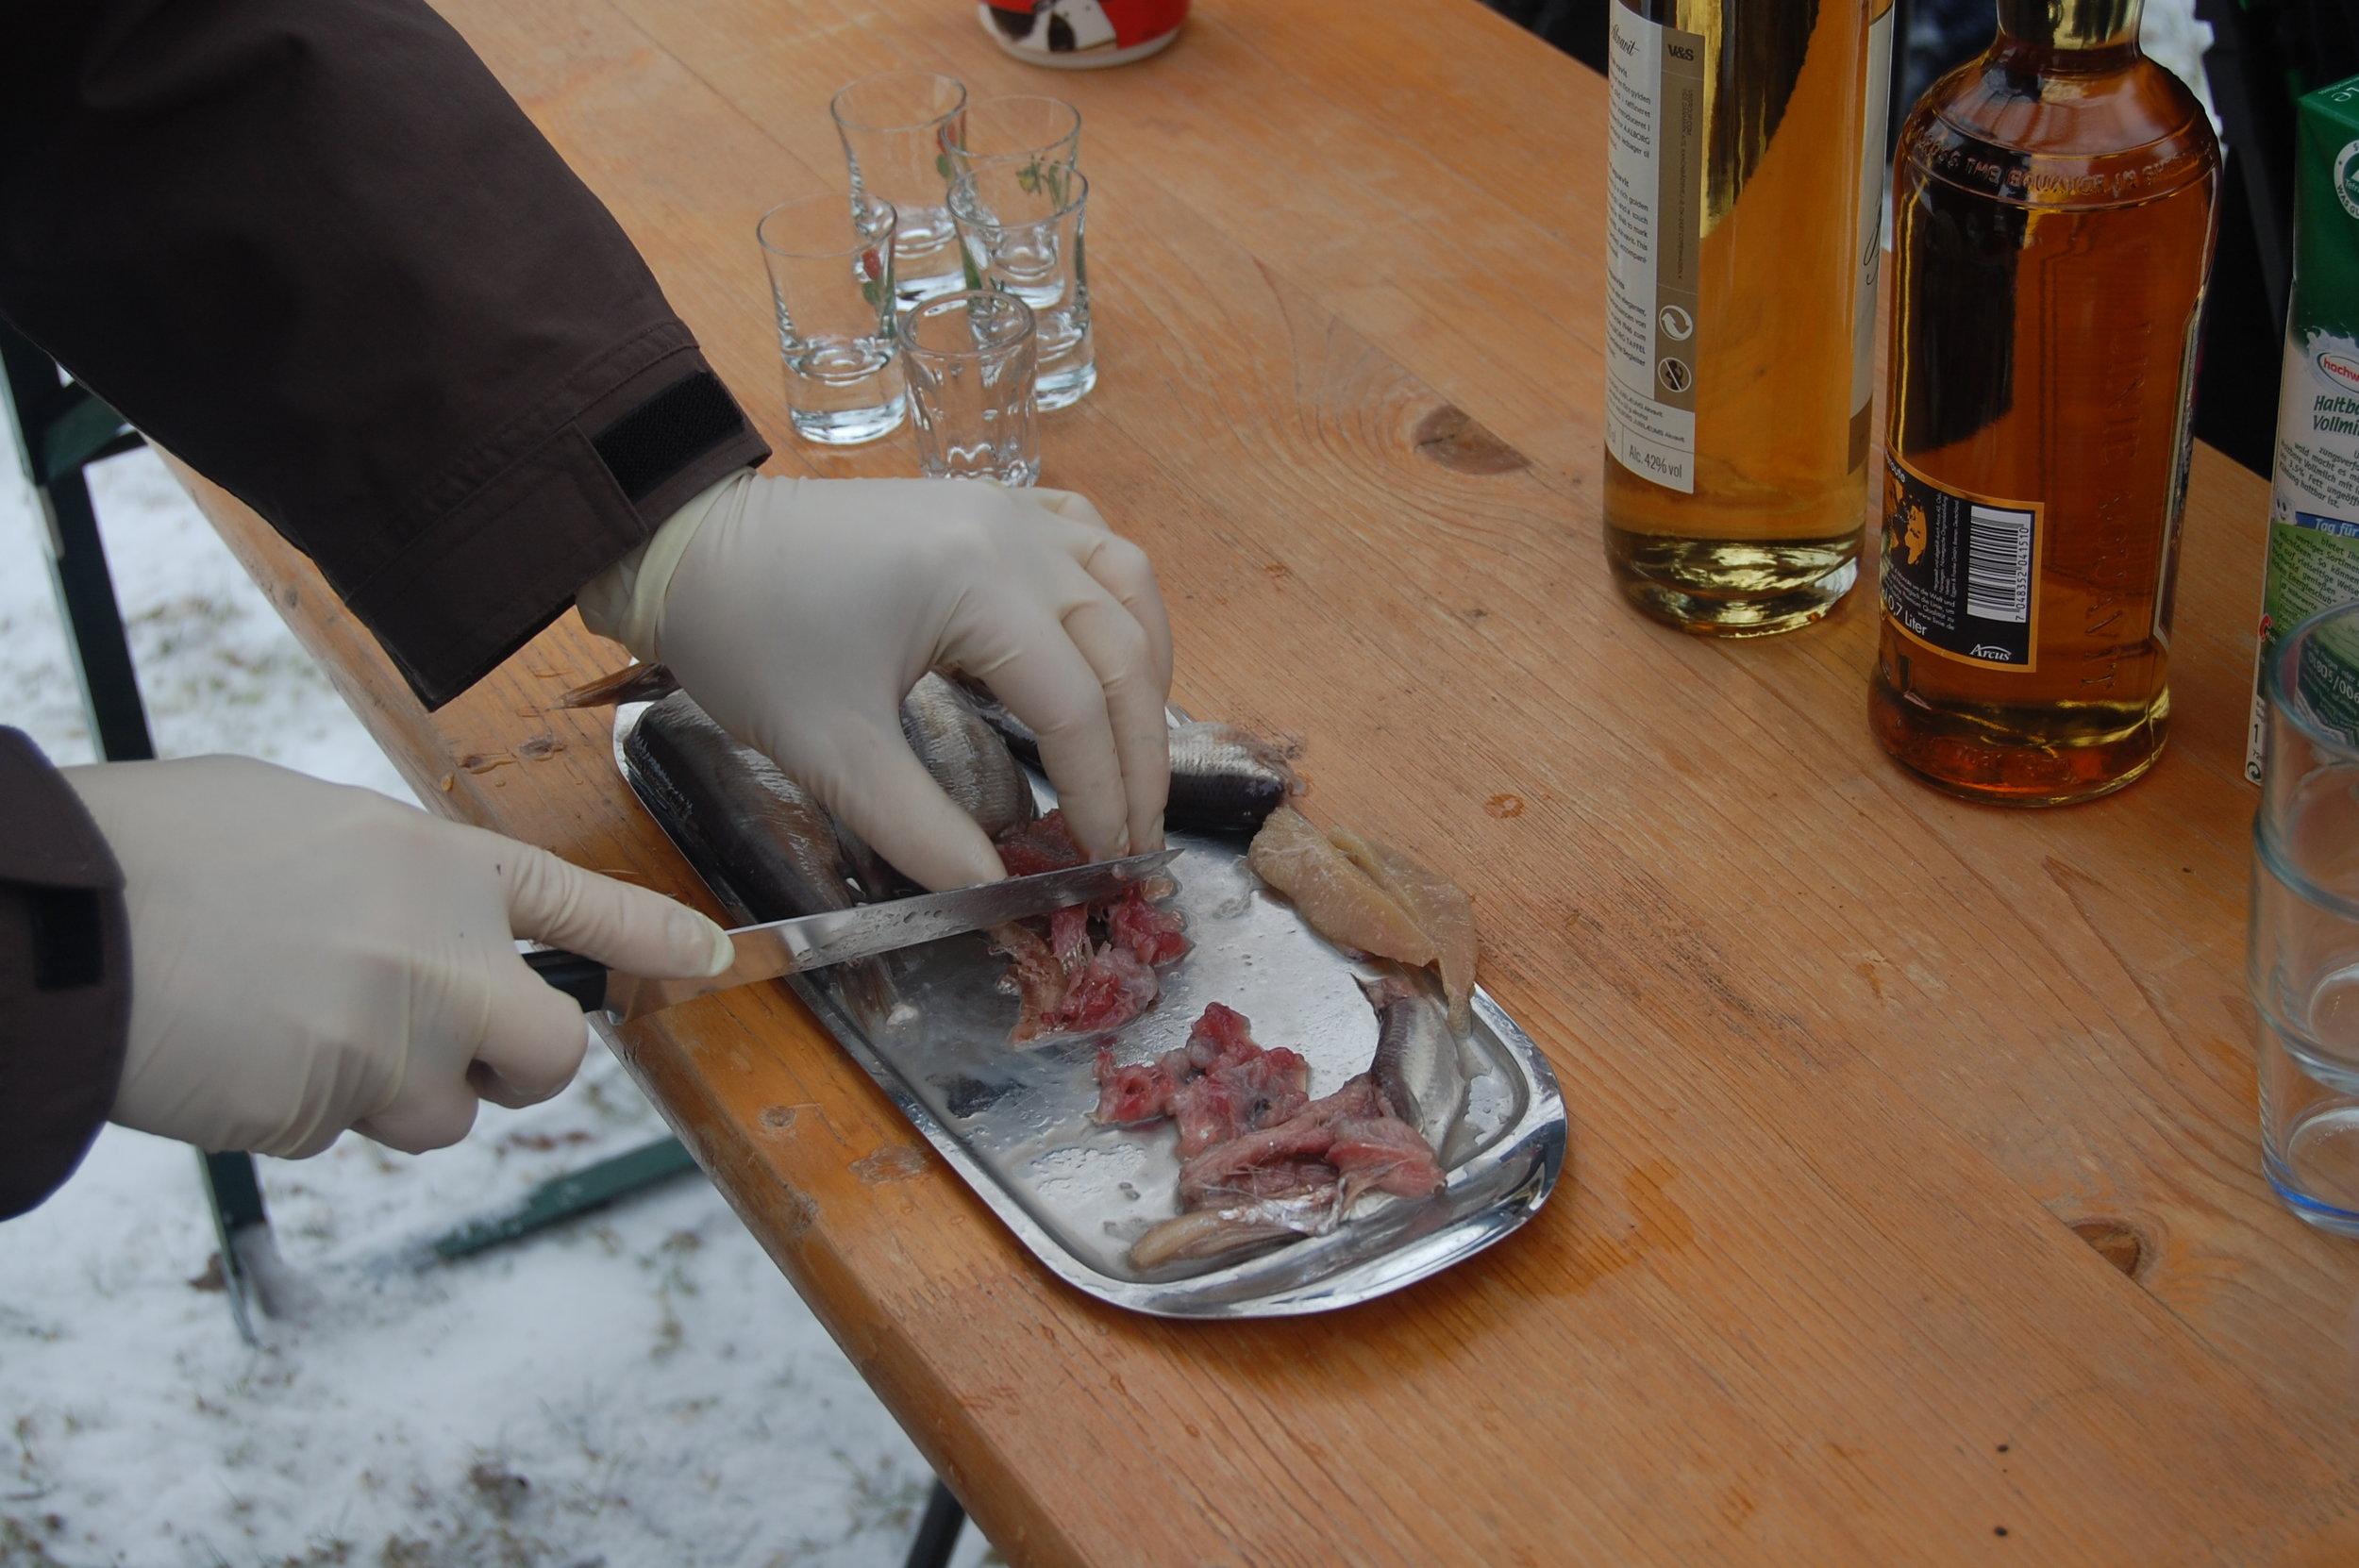 Preparando para realizar Surströmming